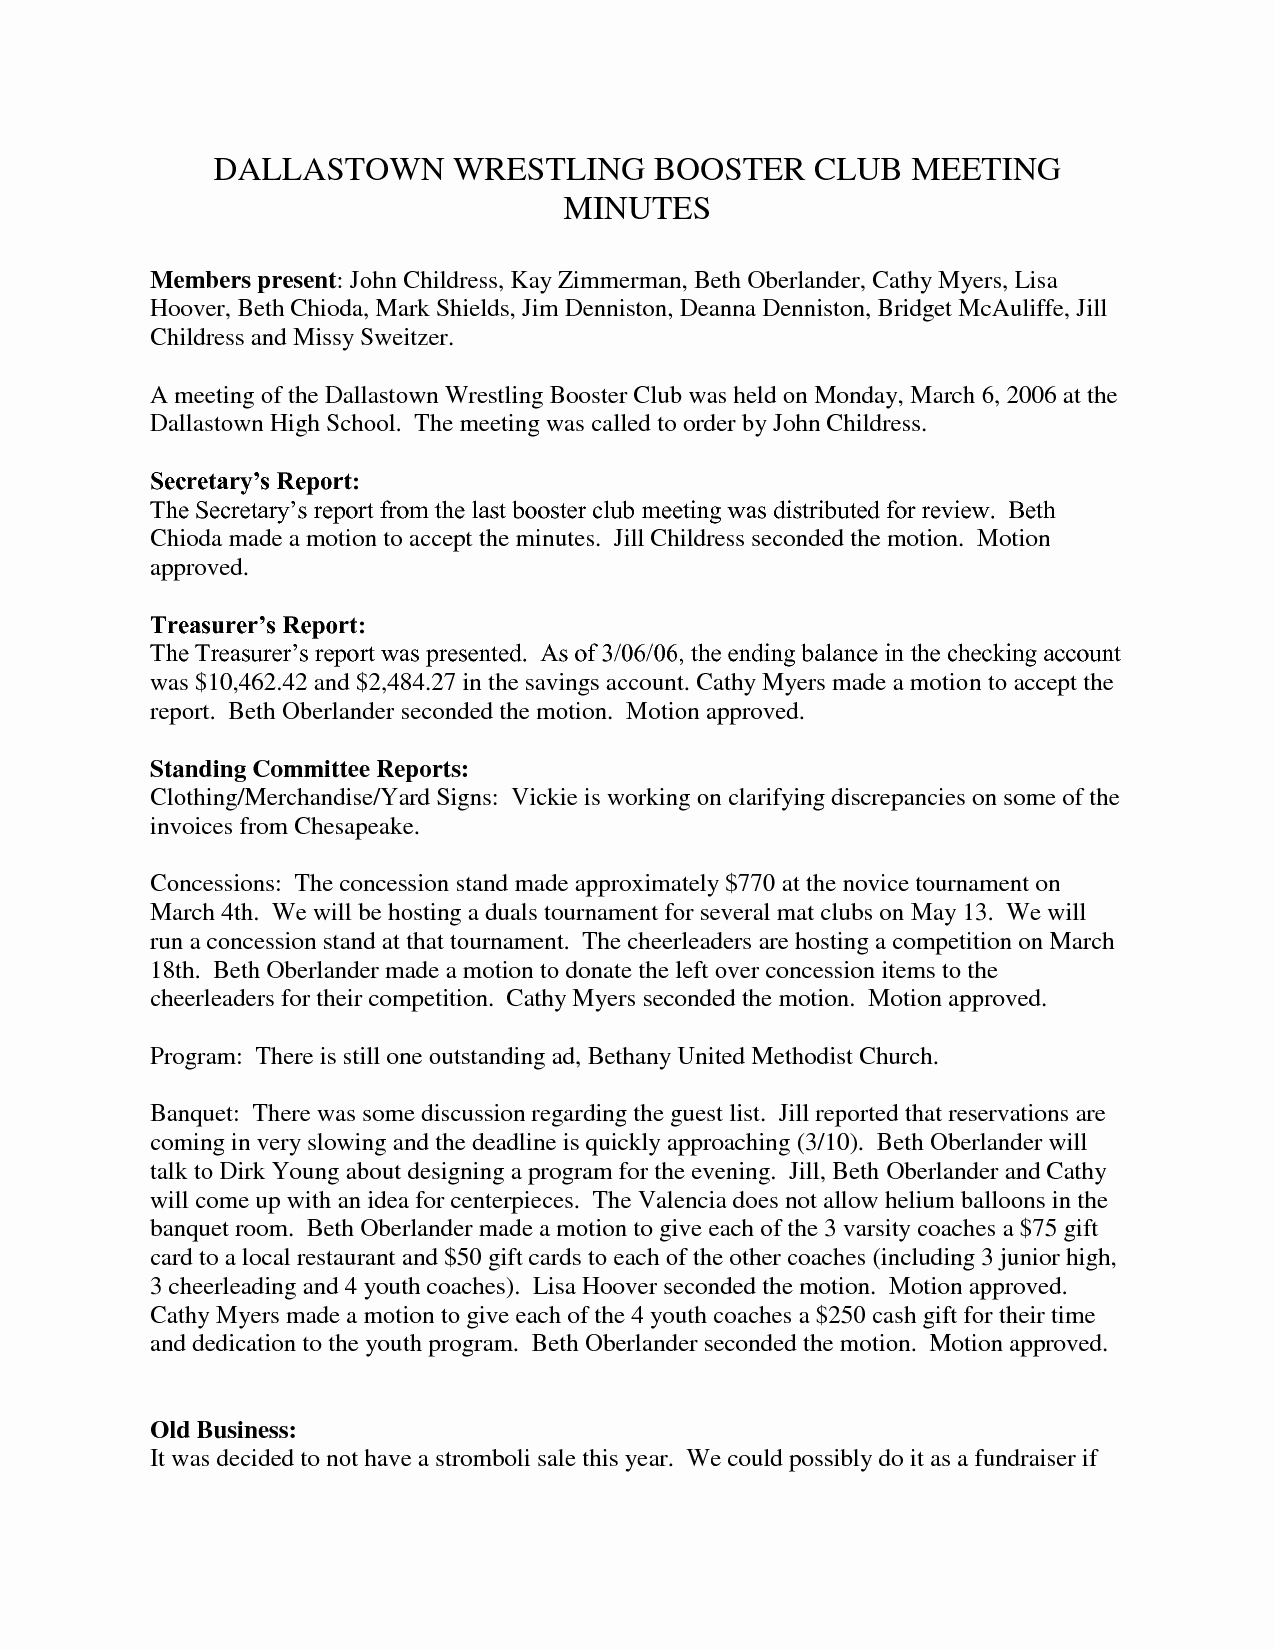 Booster Club Meeting Minutes Template Elegant 27 Of Template for Club Meeting Minutes Template